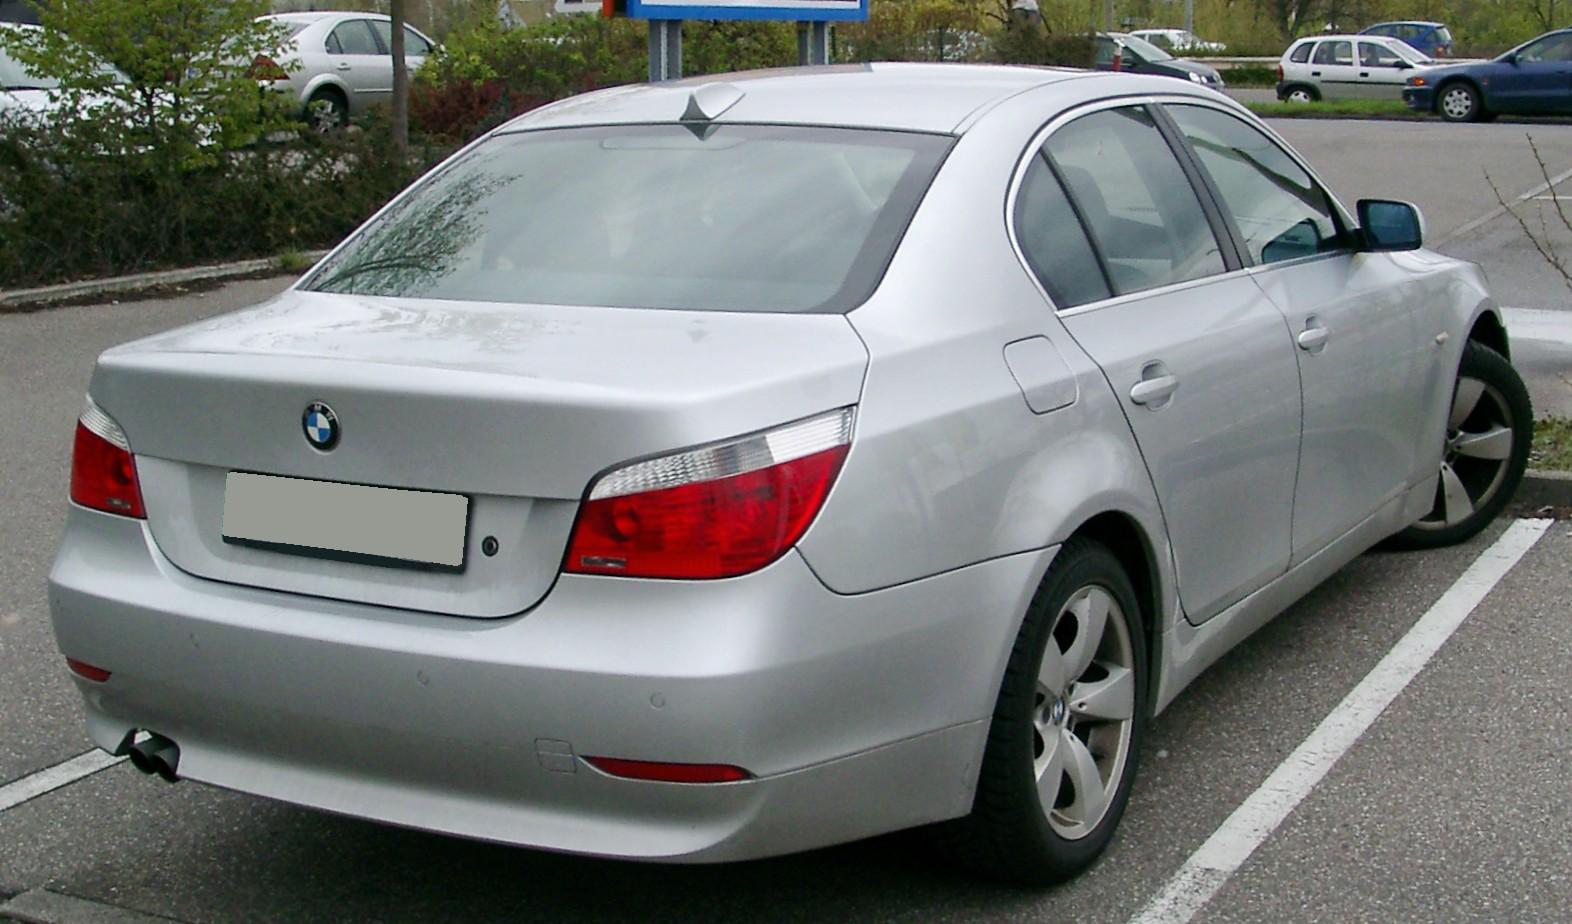 BMW Series E Wikipedia - 2007 bmw 535xi